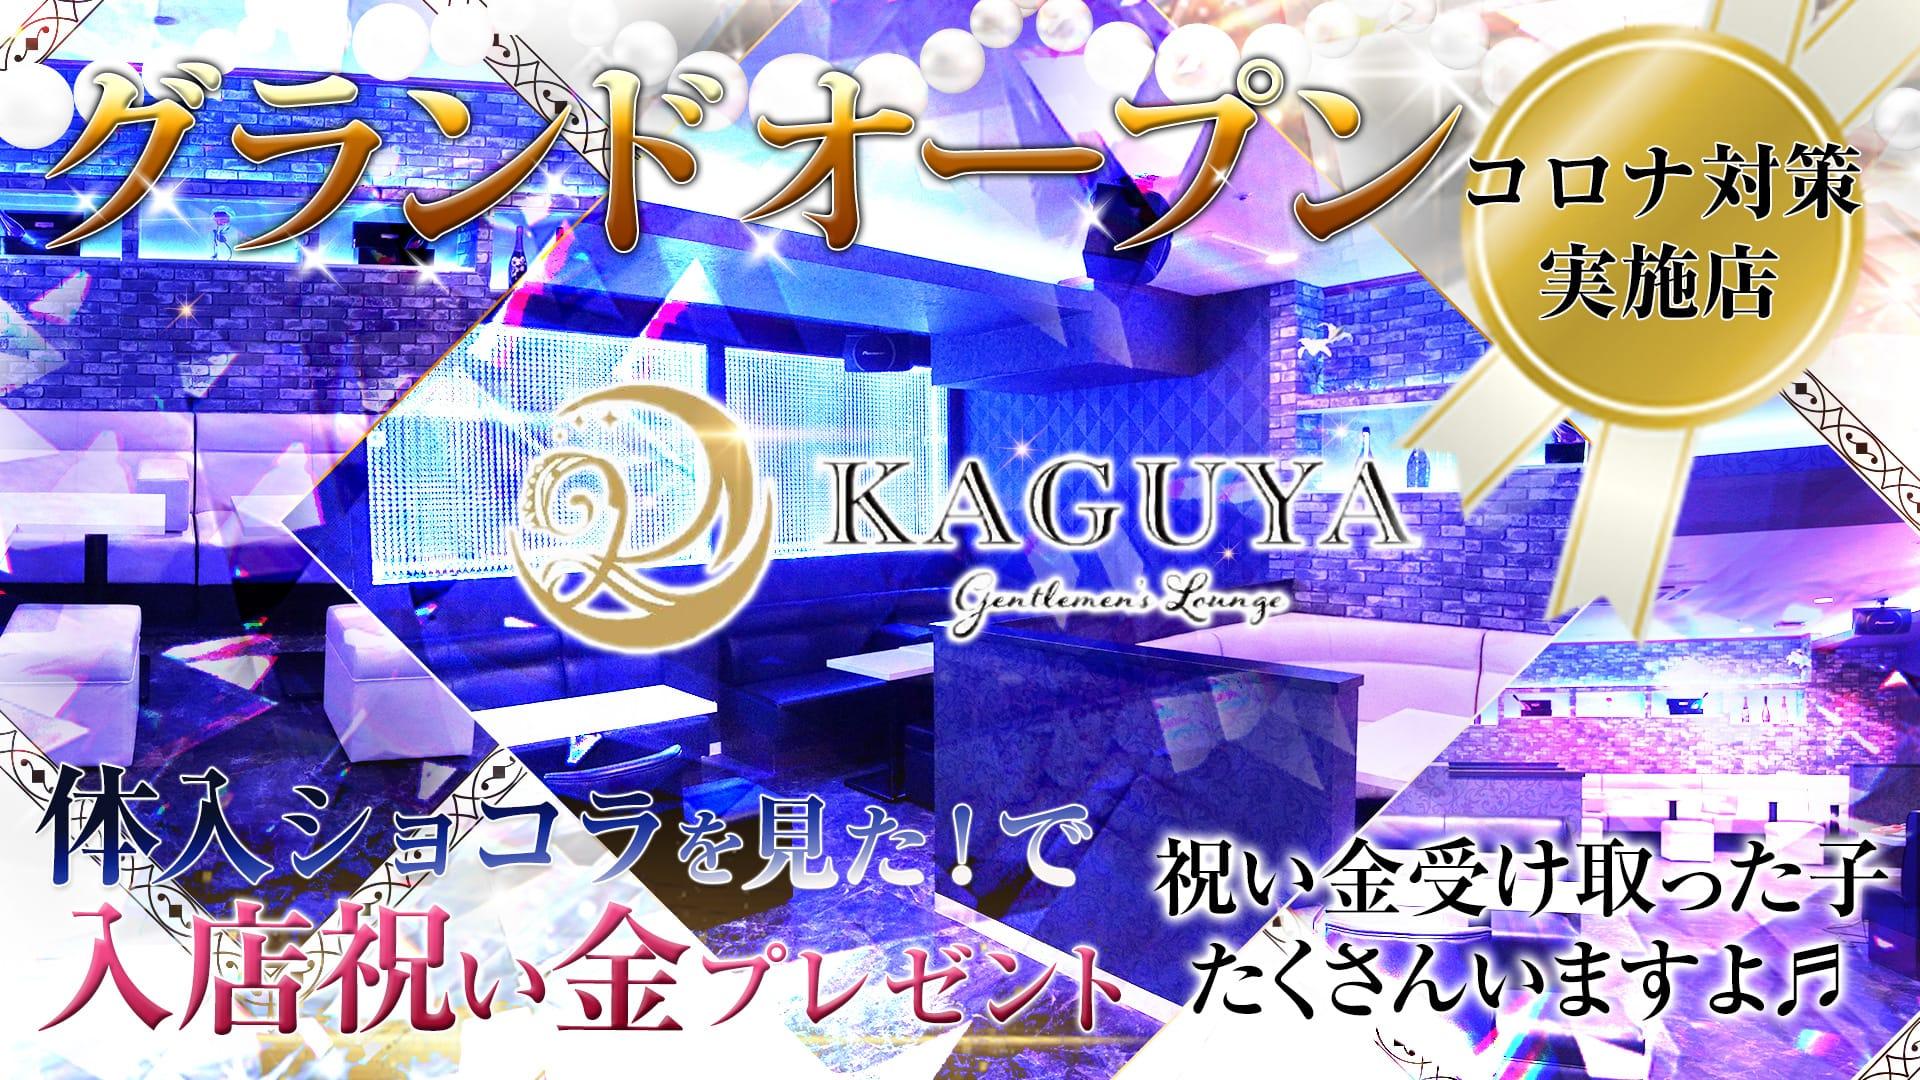 Gentlemen's Lounge KAGUYA(カグヤ)【公式求人・体入情報】 千葉キャバクラ TOP画像